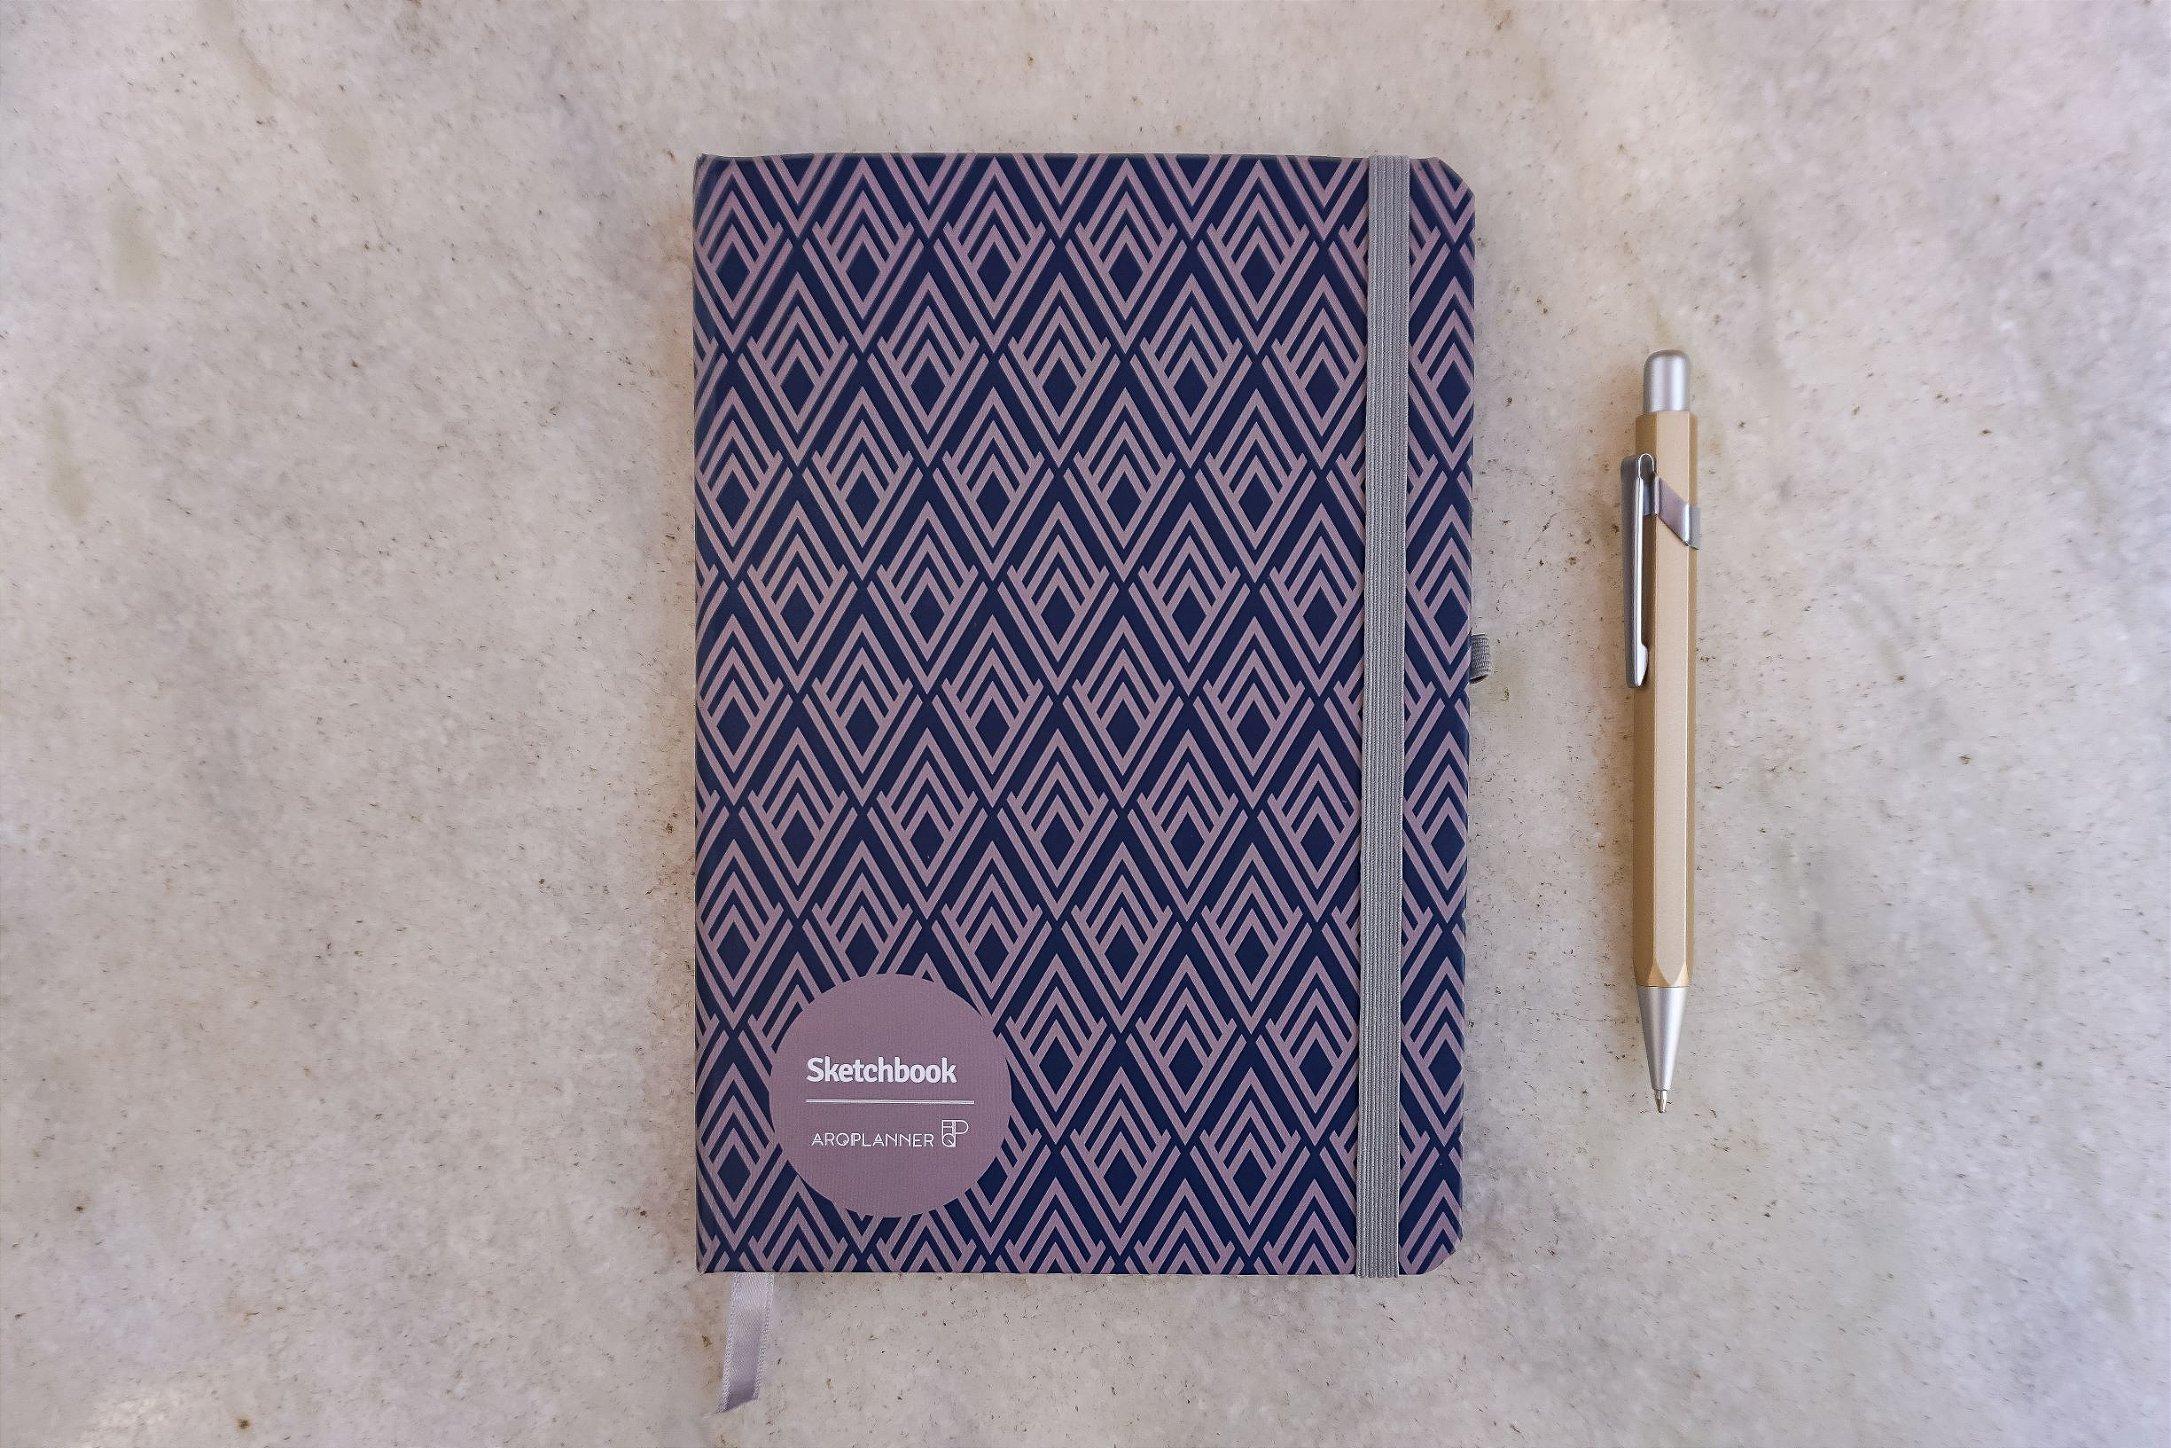 Sketchbook - Capa Linhas